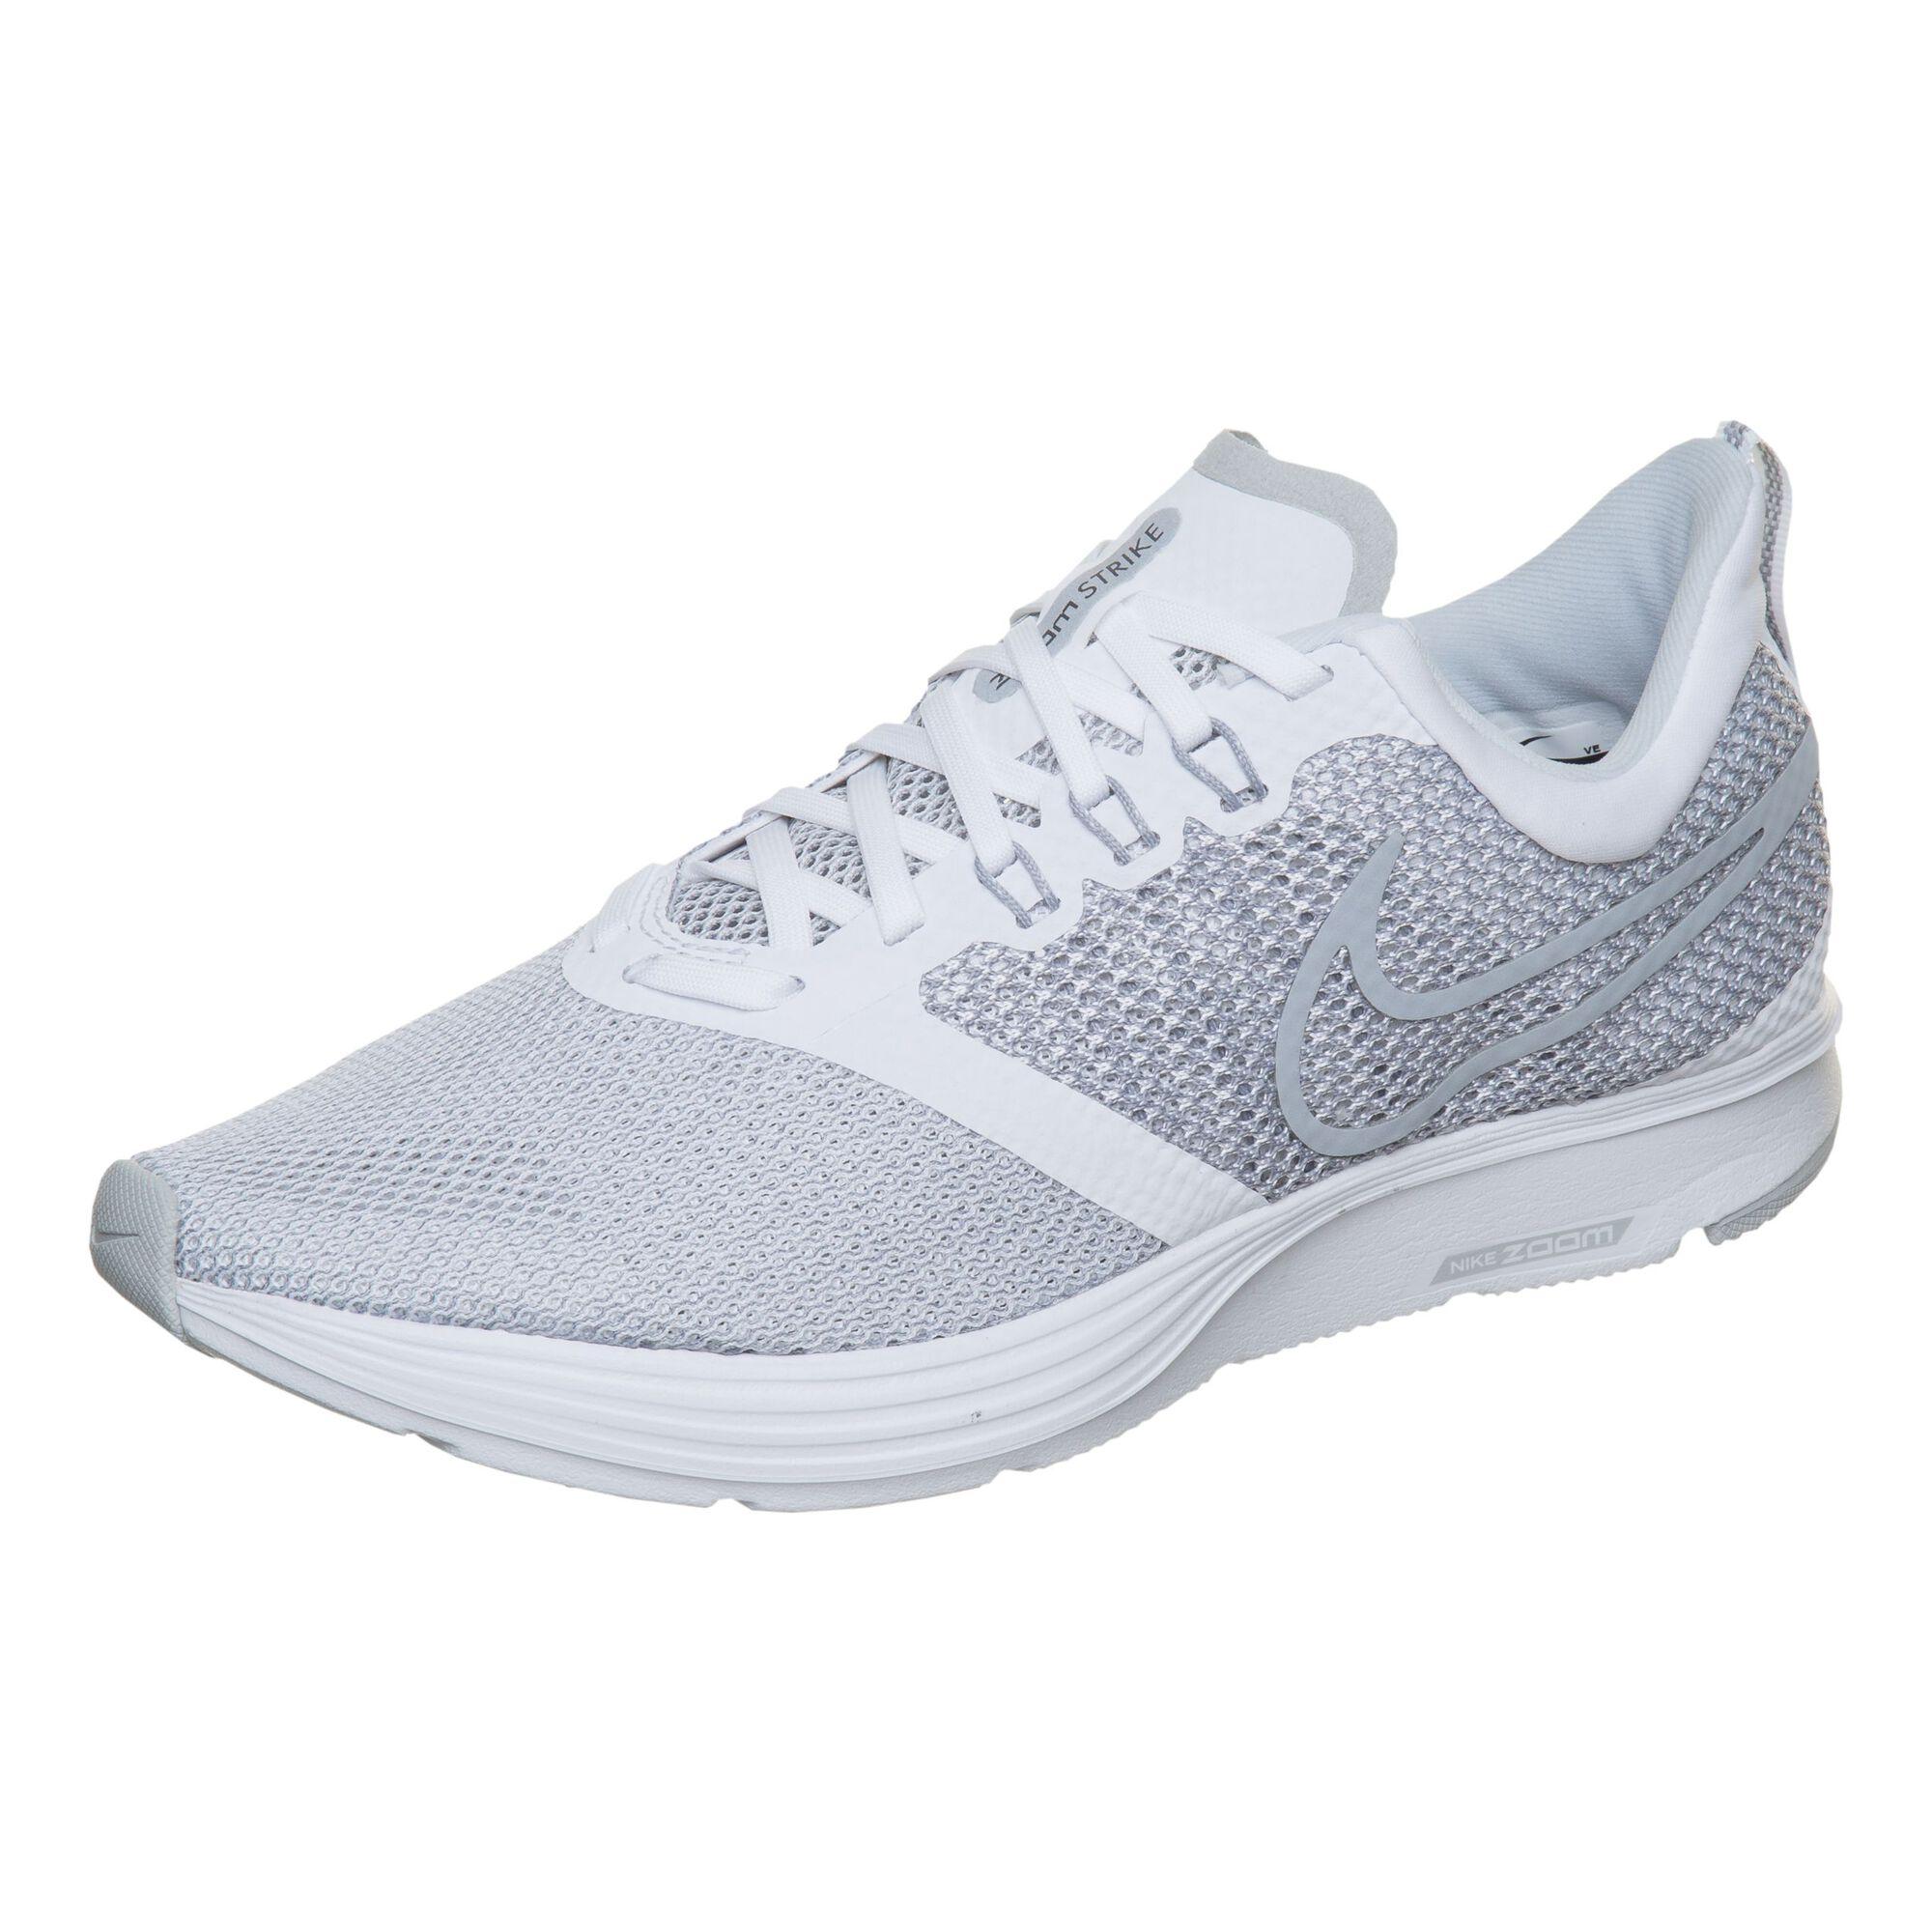 ff69b6f5892 buy Nike Zoom Strike Neutral Running Shoe Women - White